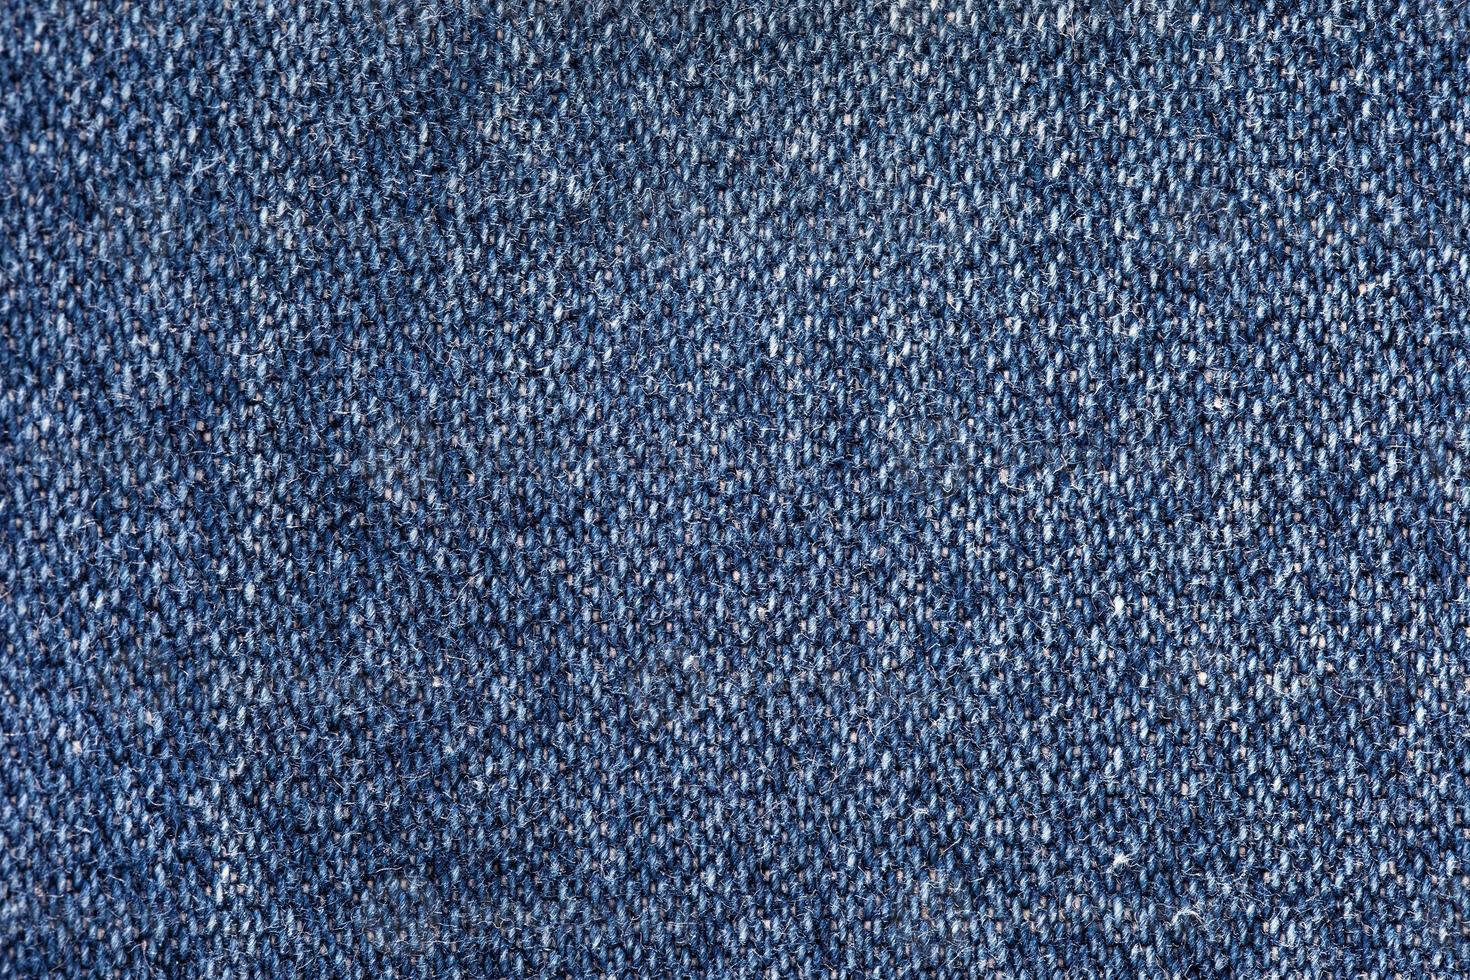 fundo e textura de jeans foto